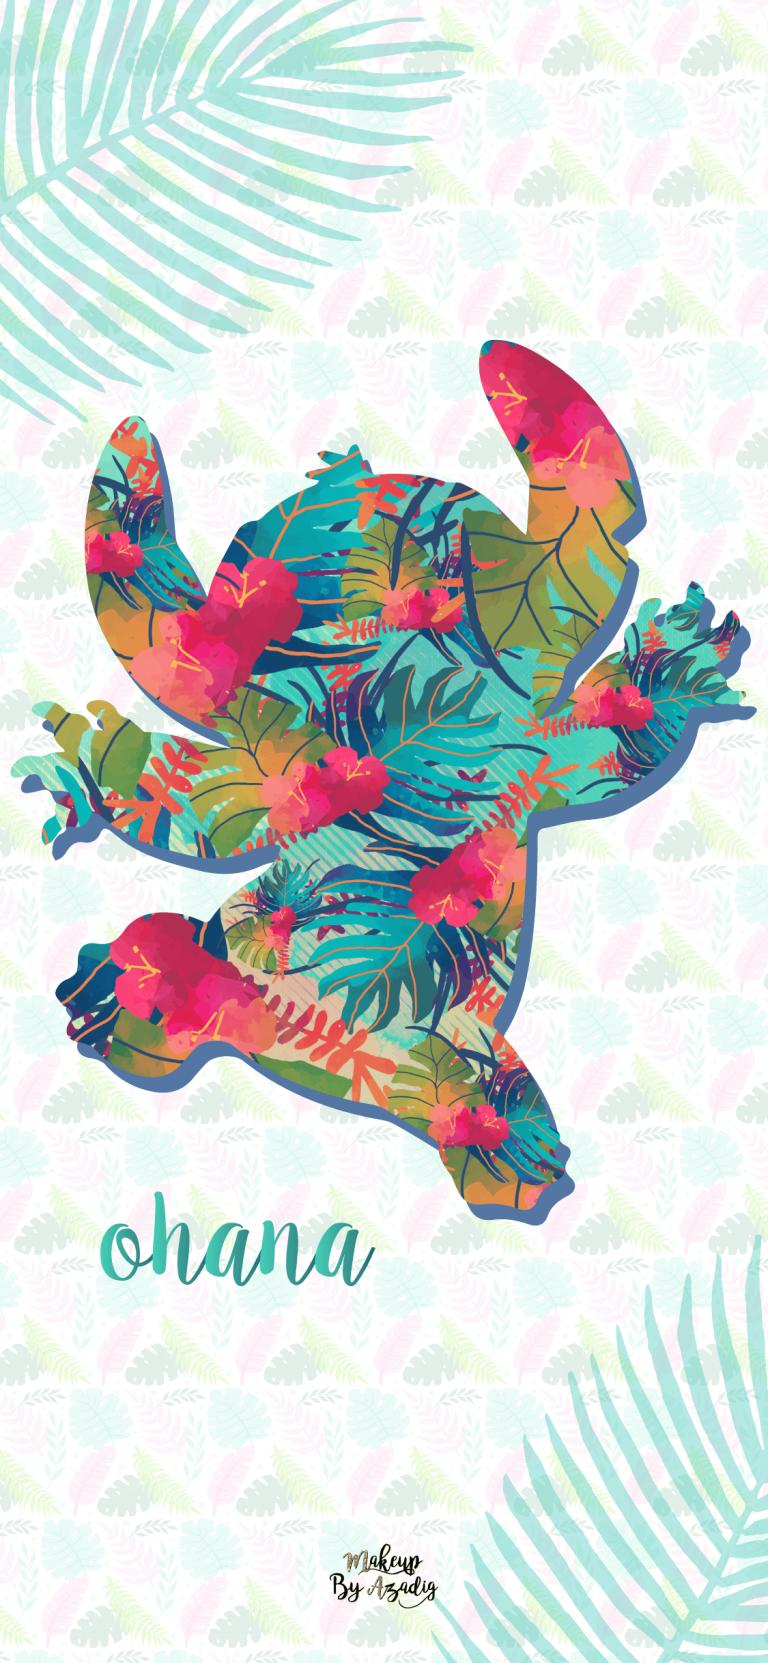 Fond Decran Wallpaper Stitch Hawai Disney Iphone X Makeupbyazadig Tendance Fond Ecran Disney Fond D Ecran De Telephone Disney Stitch Disney